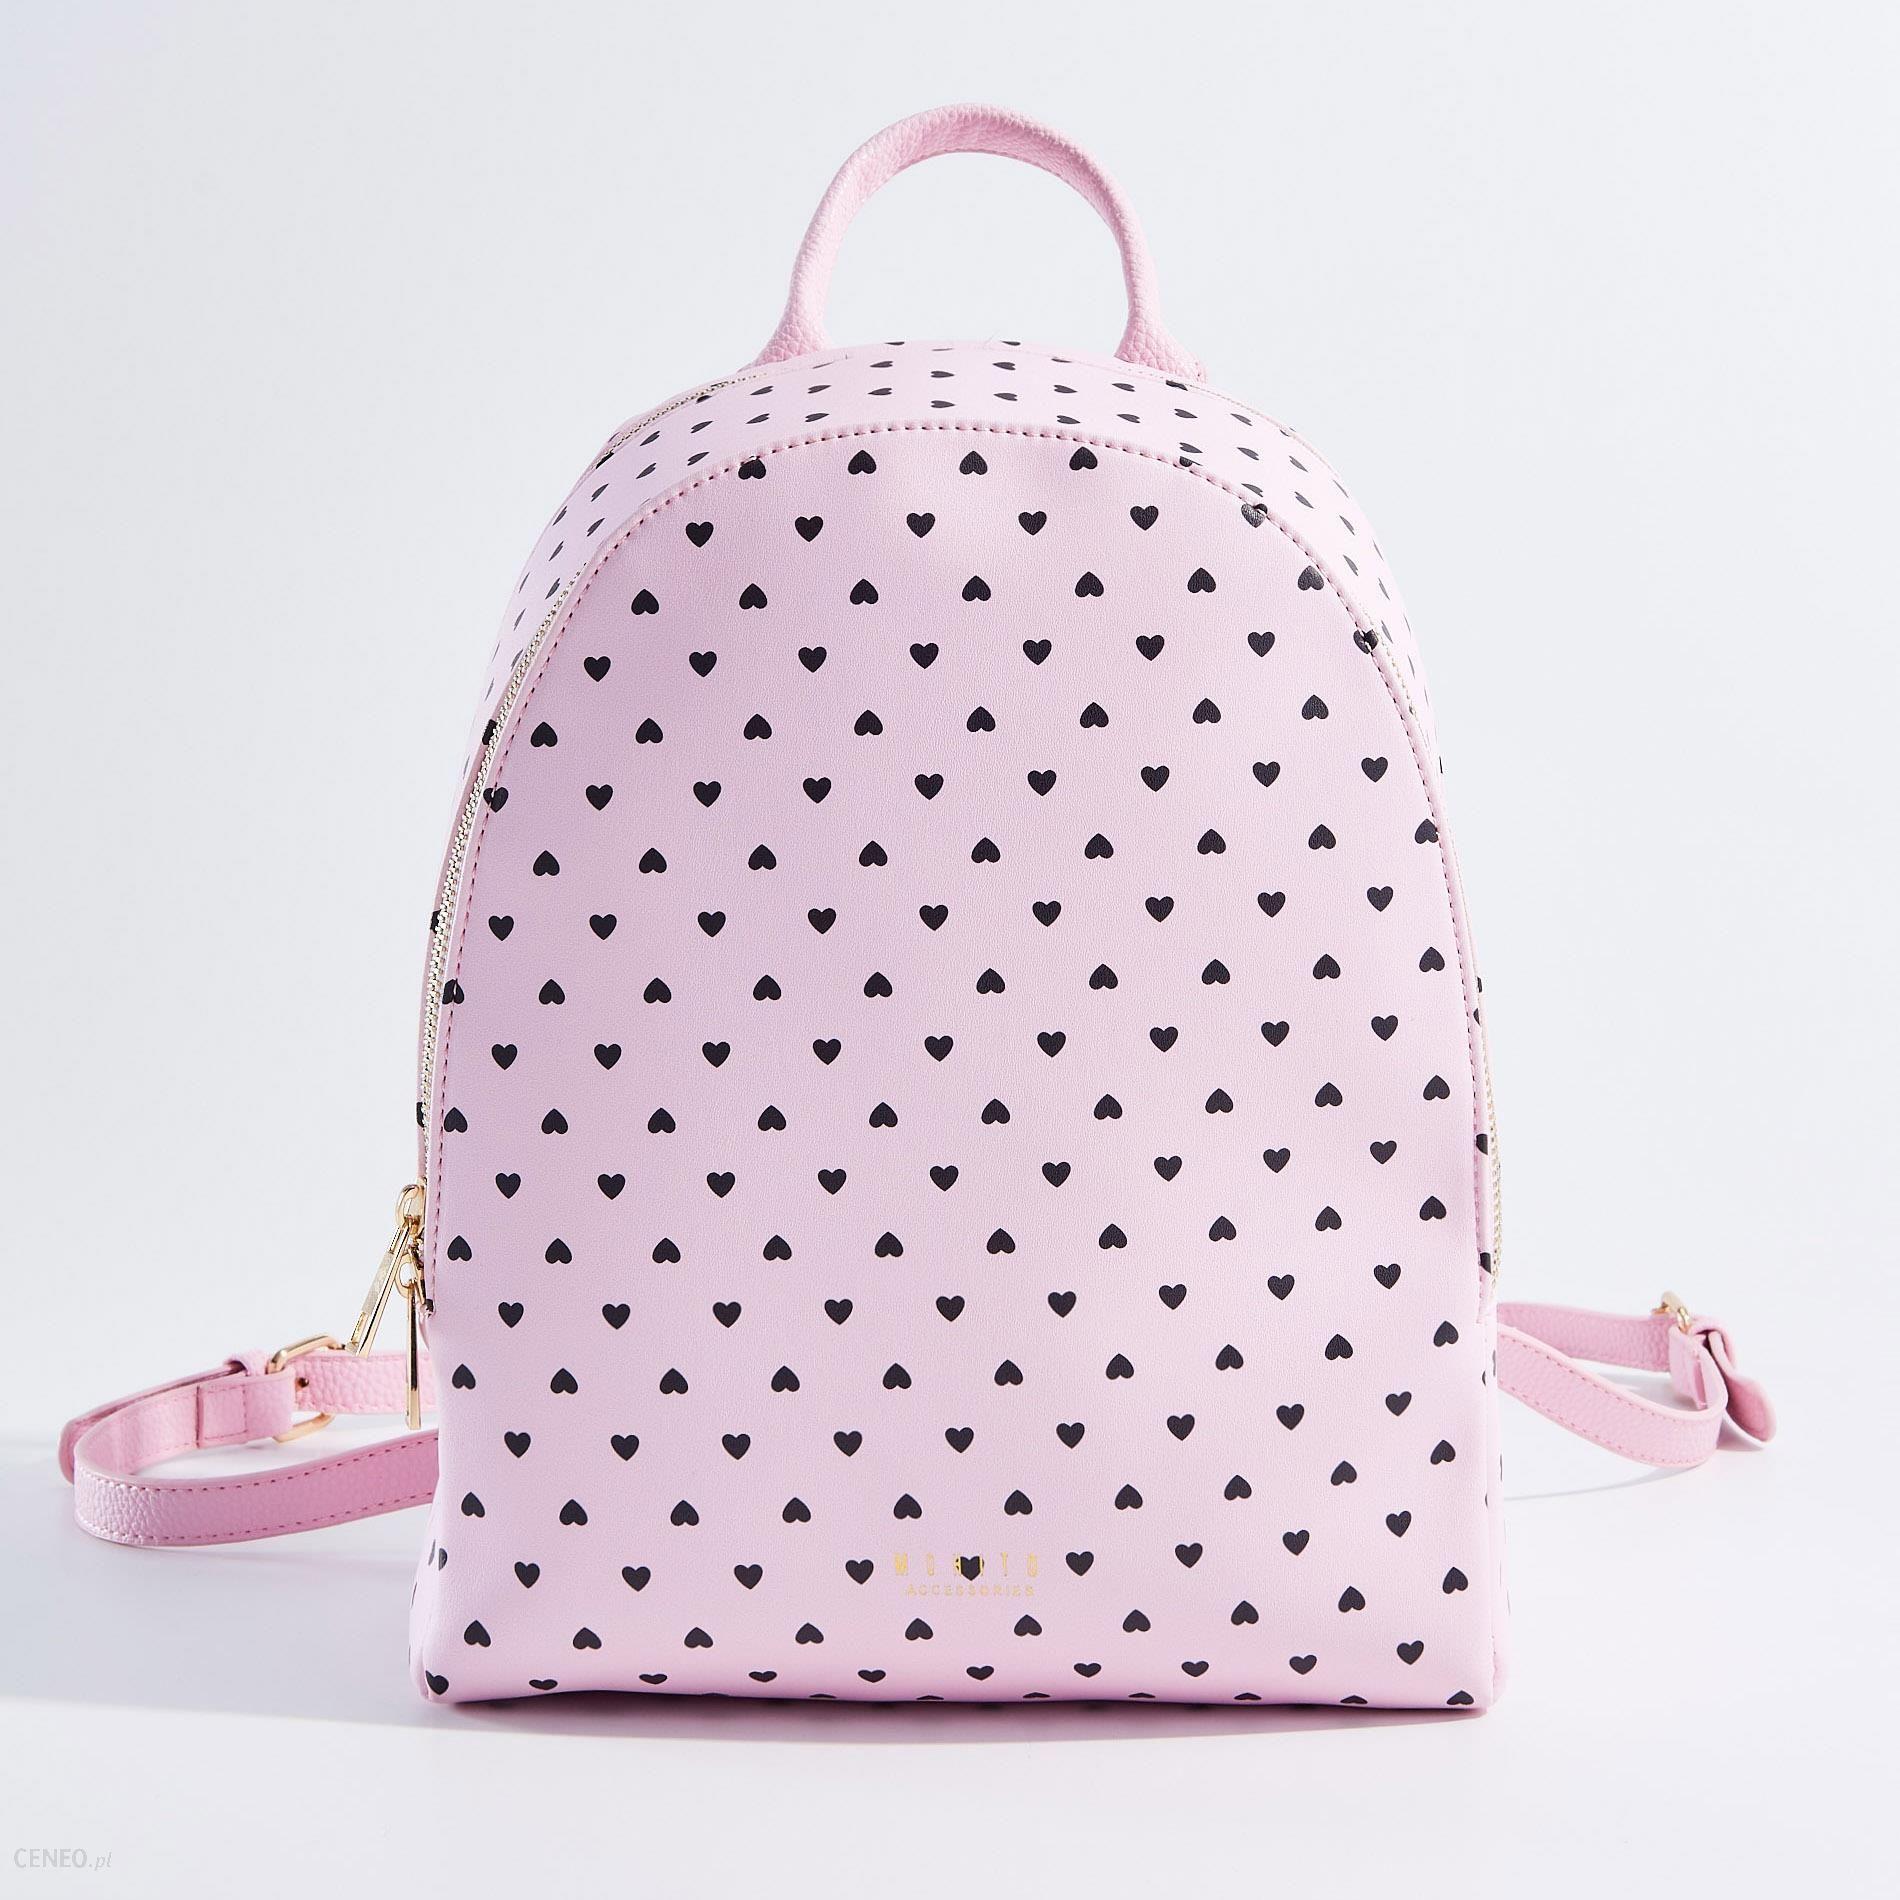 d019c055c068 Mohito - Damski plecak w serca little princess - Różowy - Ceny i ...